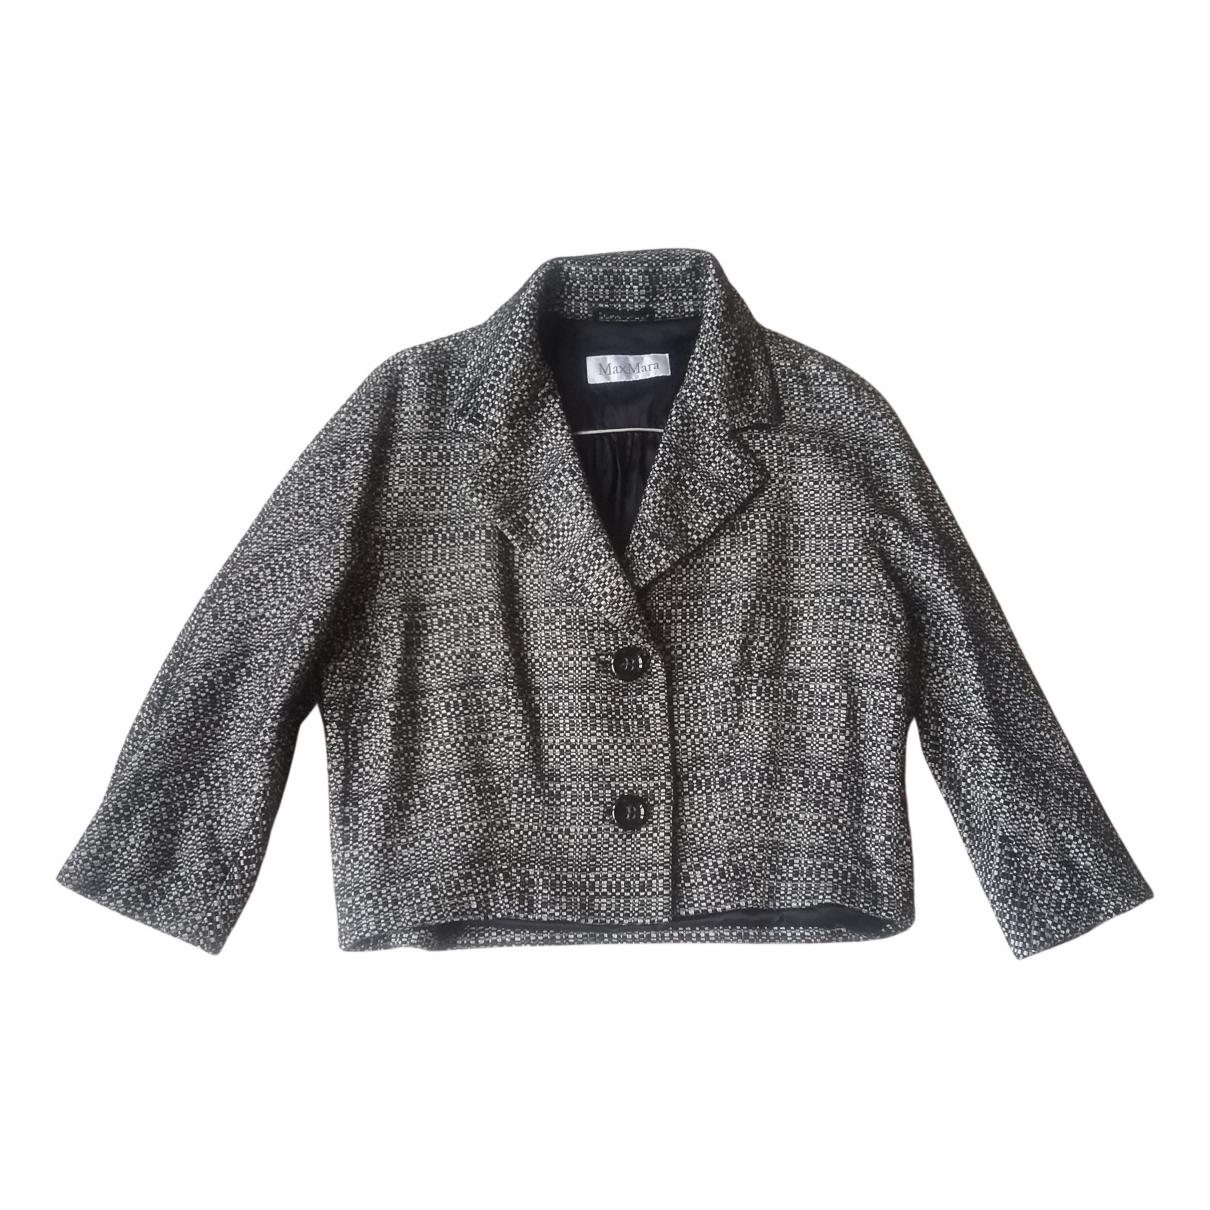 Max Mara N Black Cotton jacket for Women 44 FR